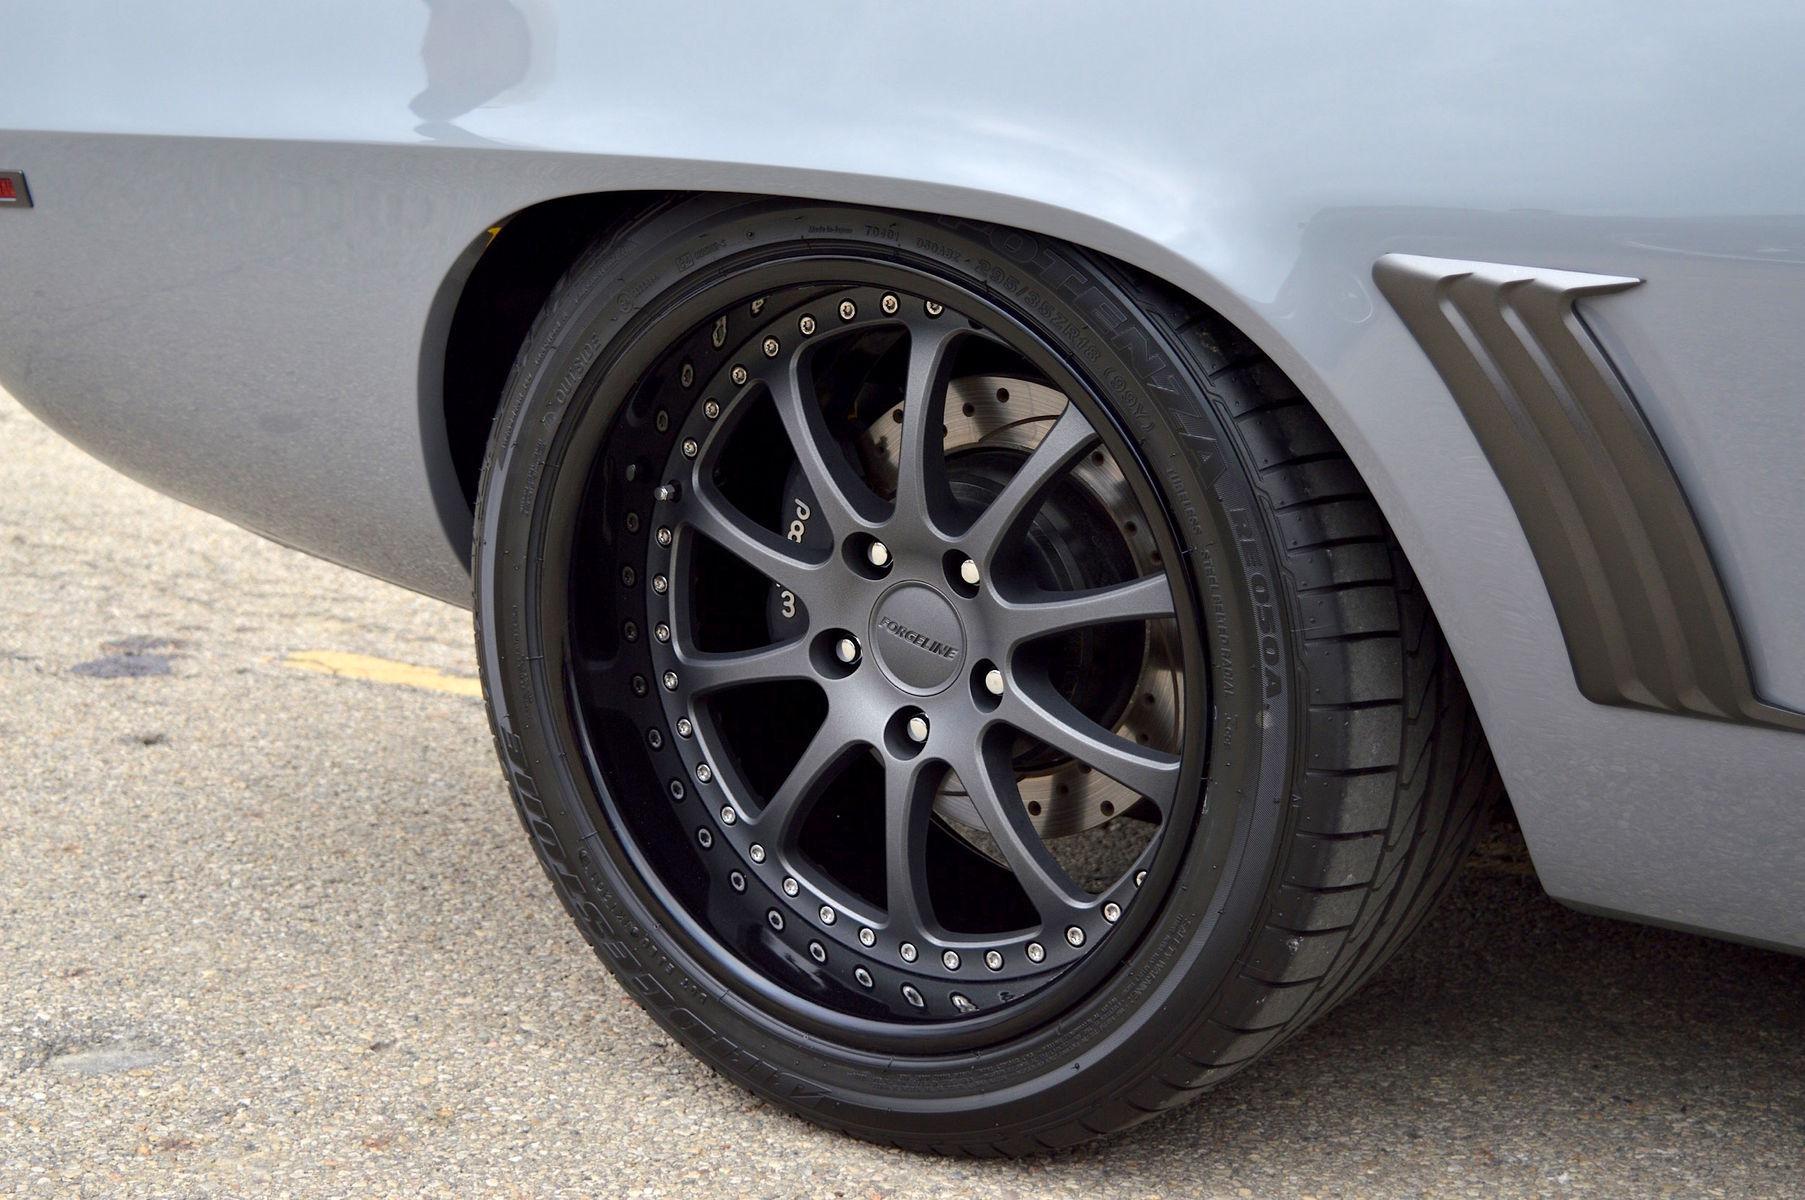 1969 Chevrolet Camaro   Kip Murphy's Wraith 1969 Camaro on Forgeline ZX3P Wheels - Close Up Wheel Shot